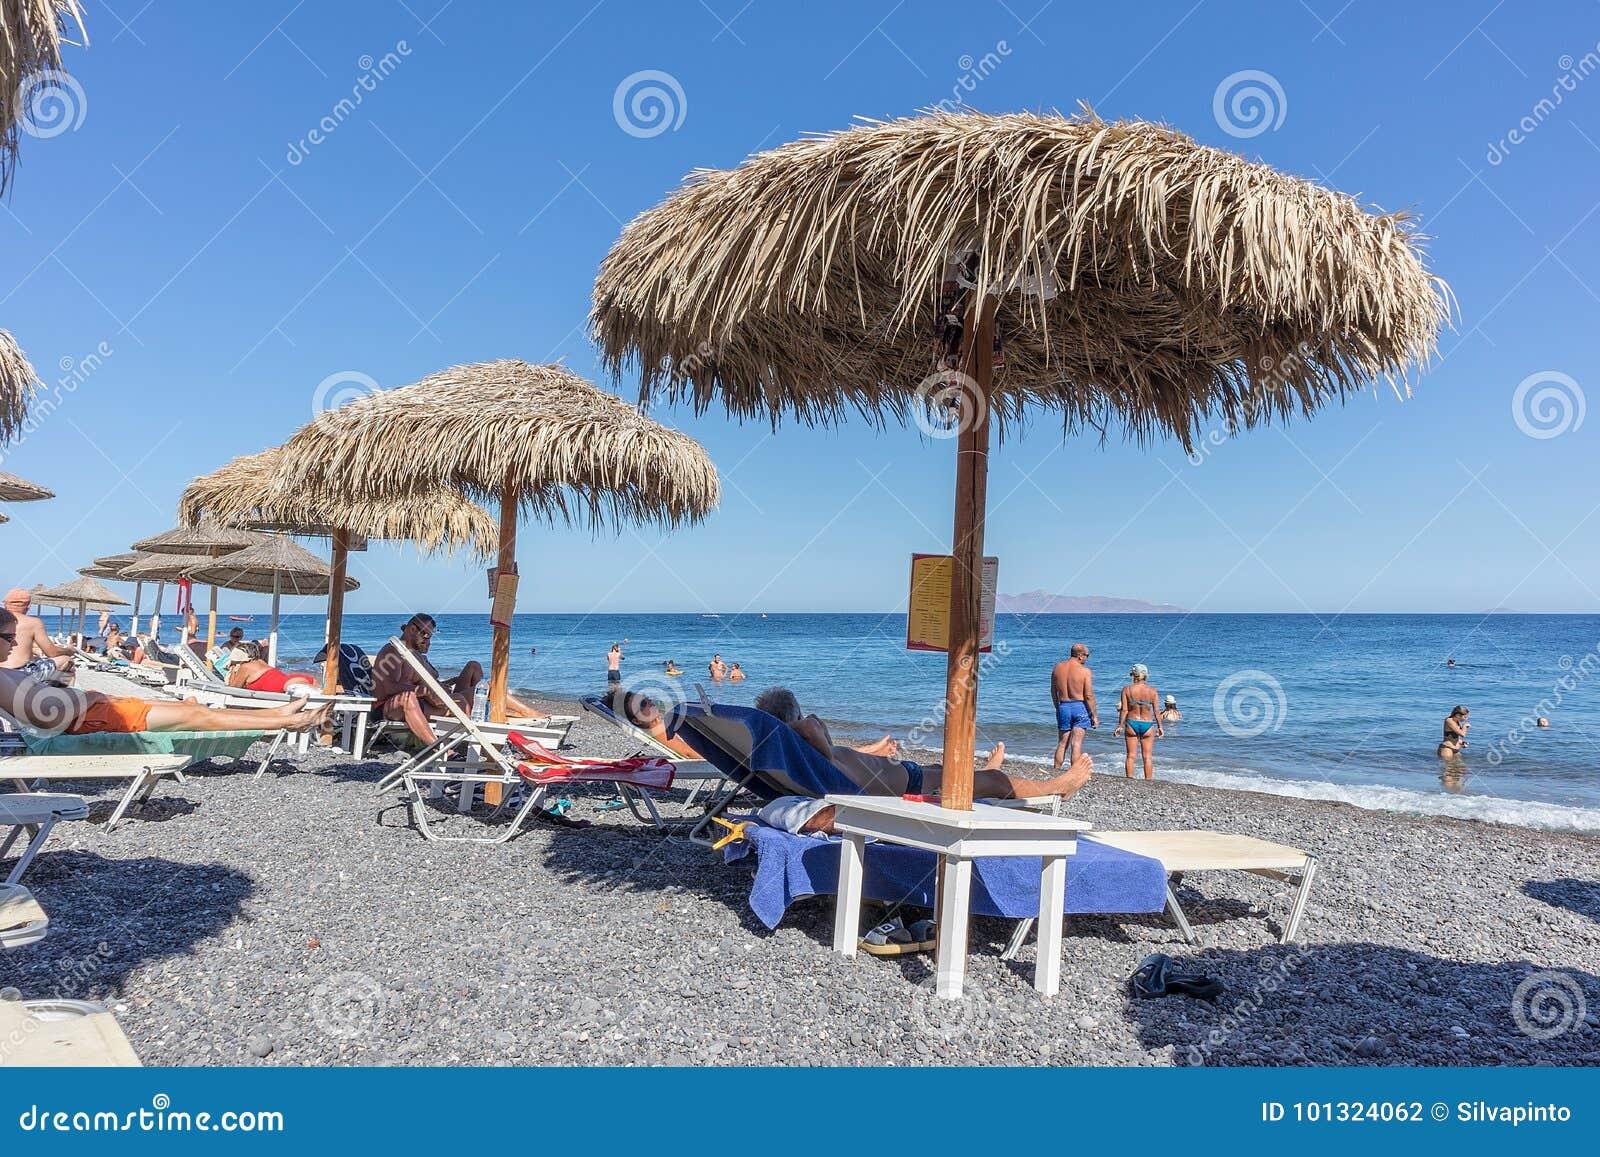 SANTORINI/GREECE στις 5 Σεπτεμβρίου - παραλία Kamari σε Santorini, Ελλάδα